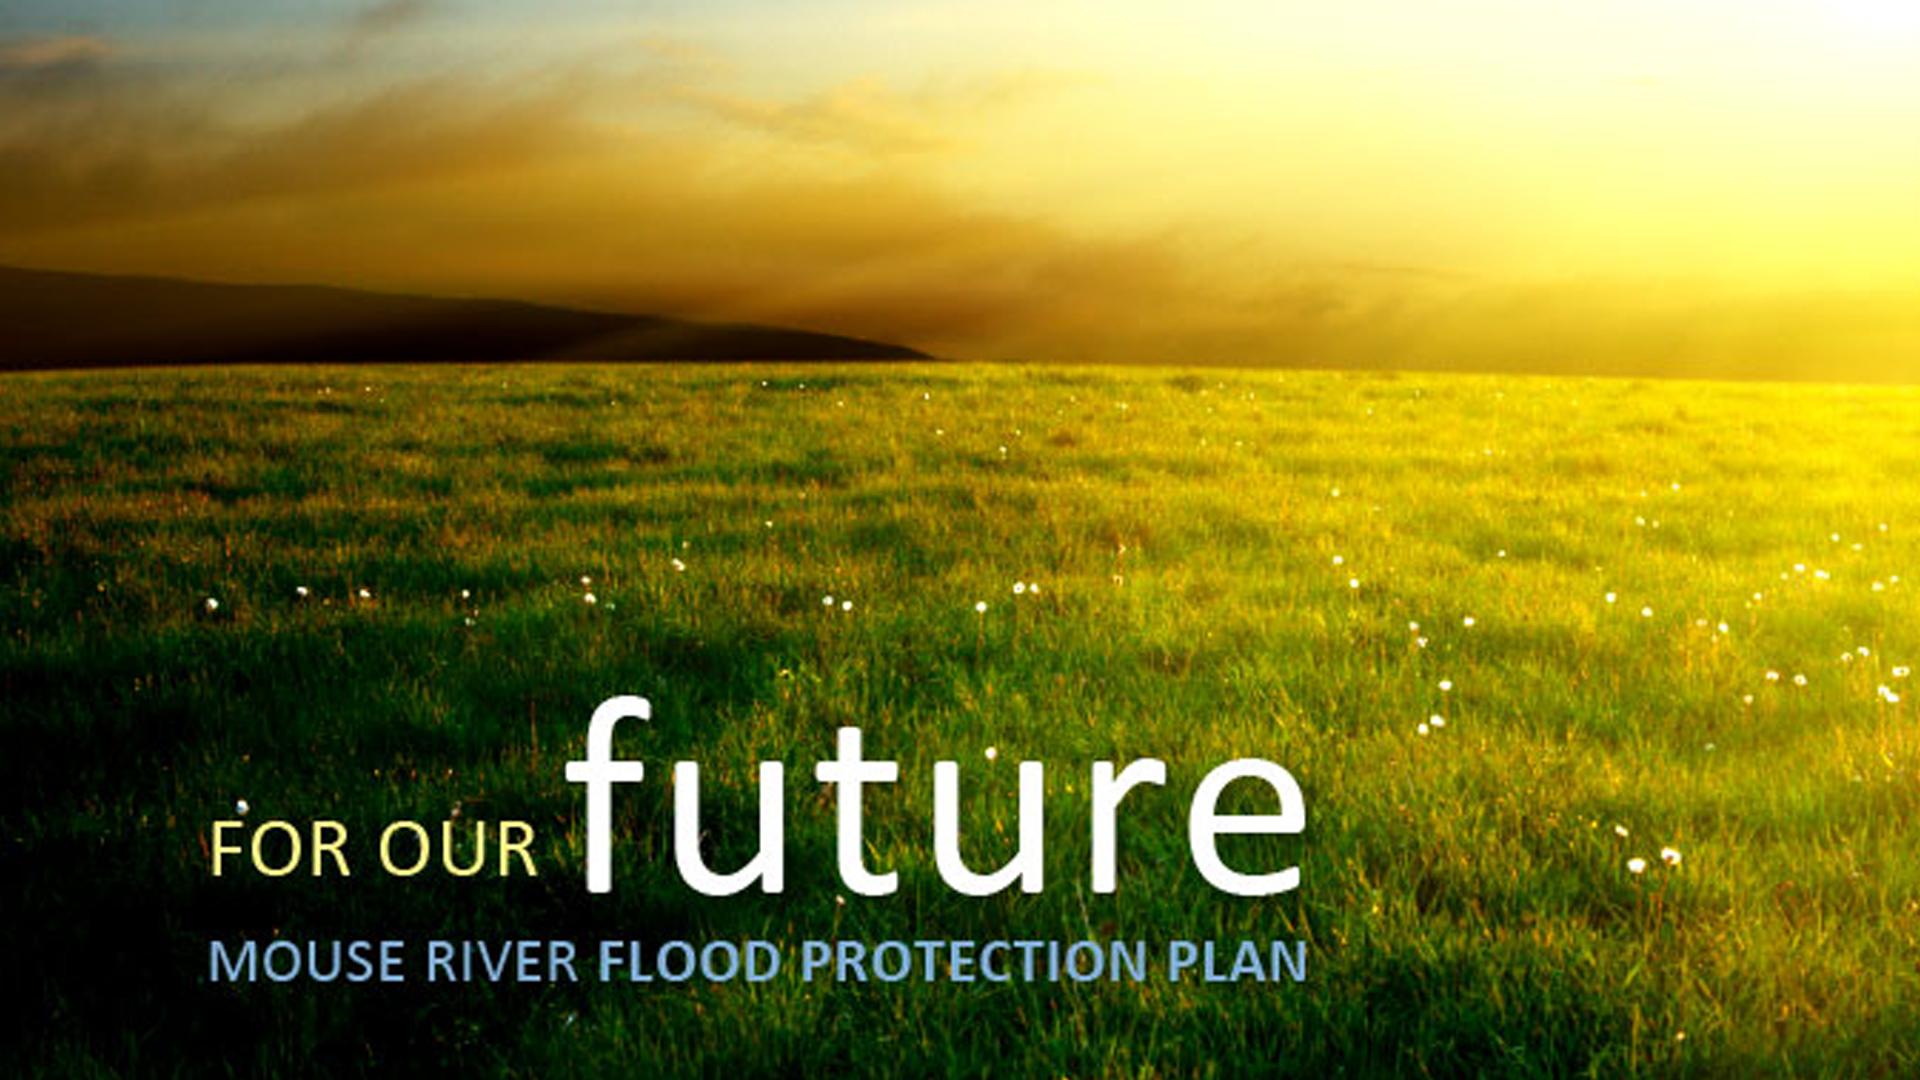 1050 Flood Protection Plan_1517871246533.png.jpg